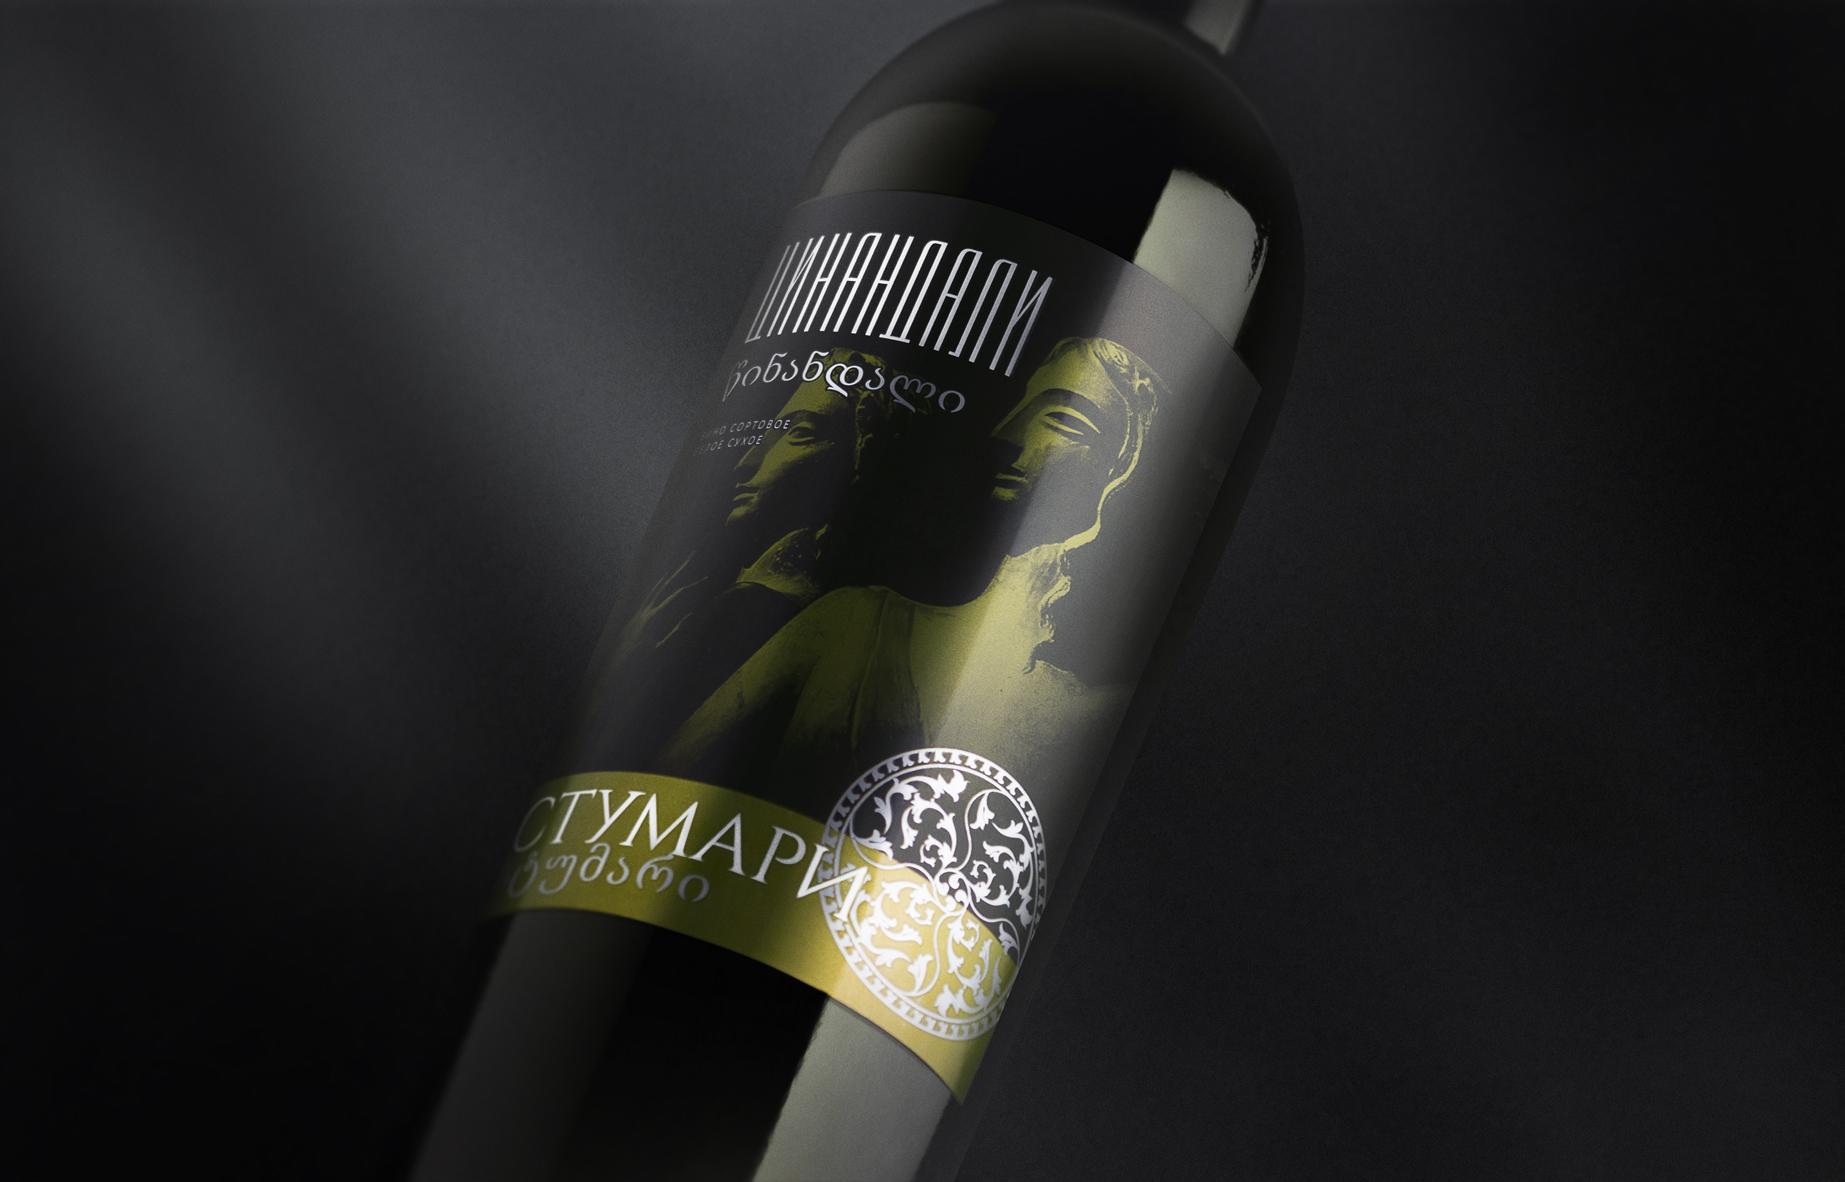 Krylia FMCG Branding Create New Identity for Noble Wines Stumari from the Heart of Kakheti – Georgia